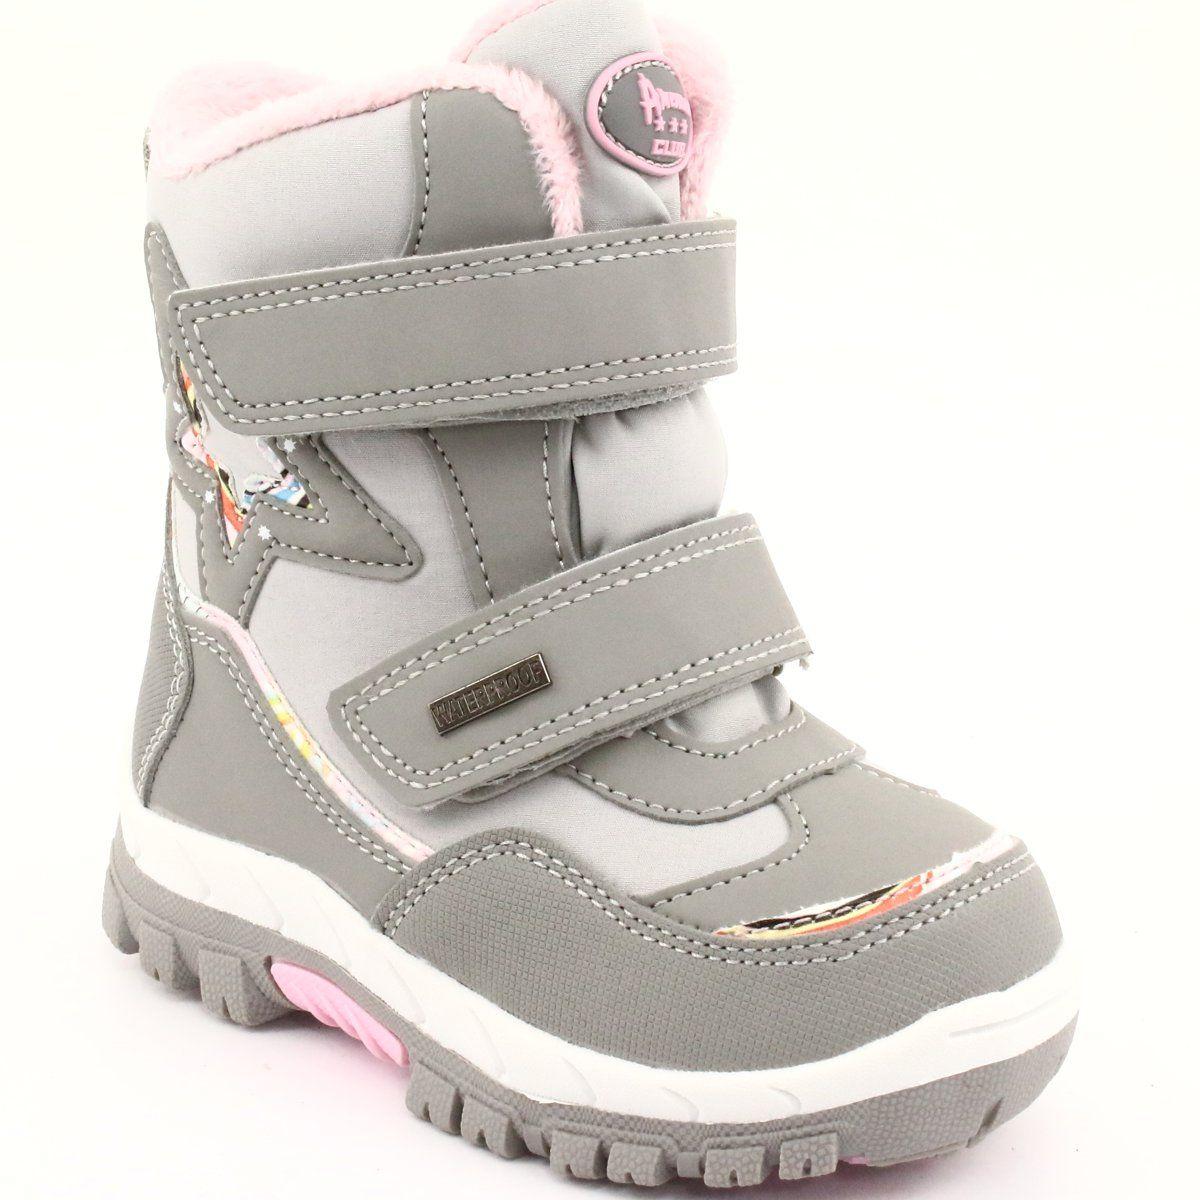 American Club Kozaki Z Membrana Rl37 Gwiazda Szare Rozowe Childrens Boots Boots Kid Shoes